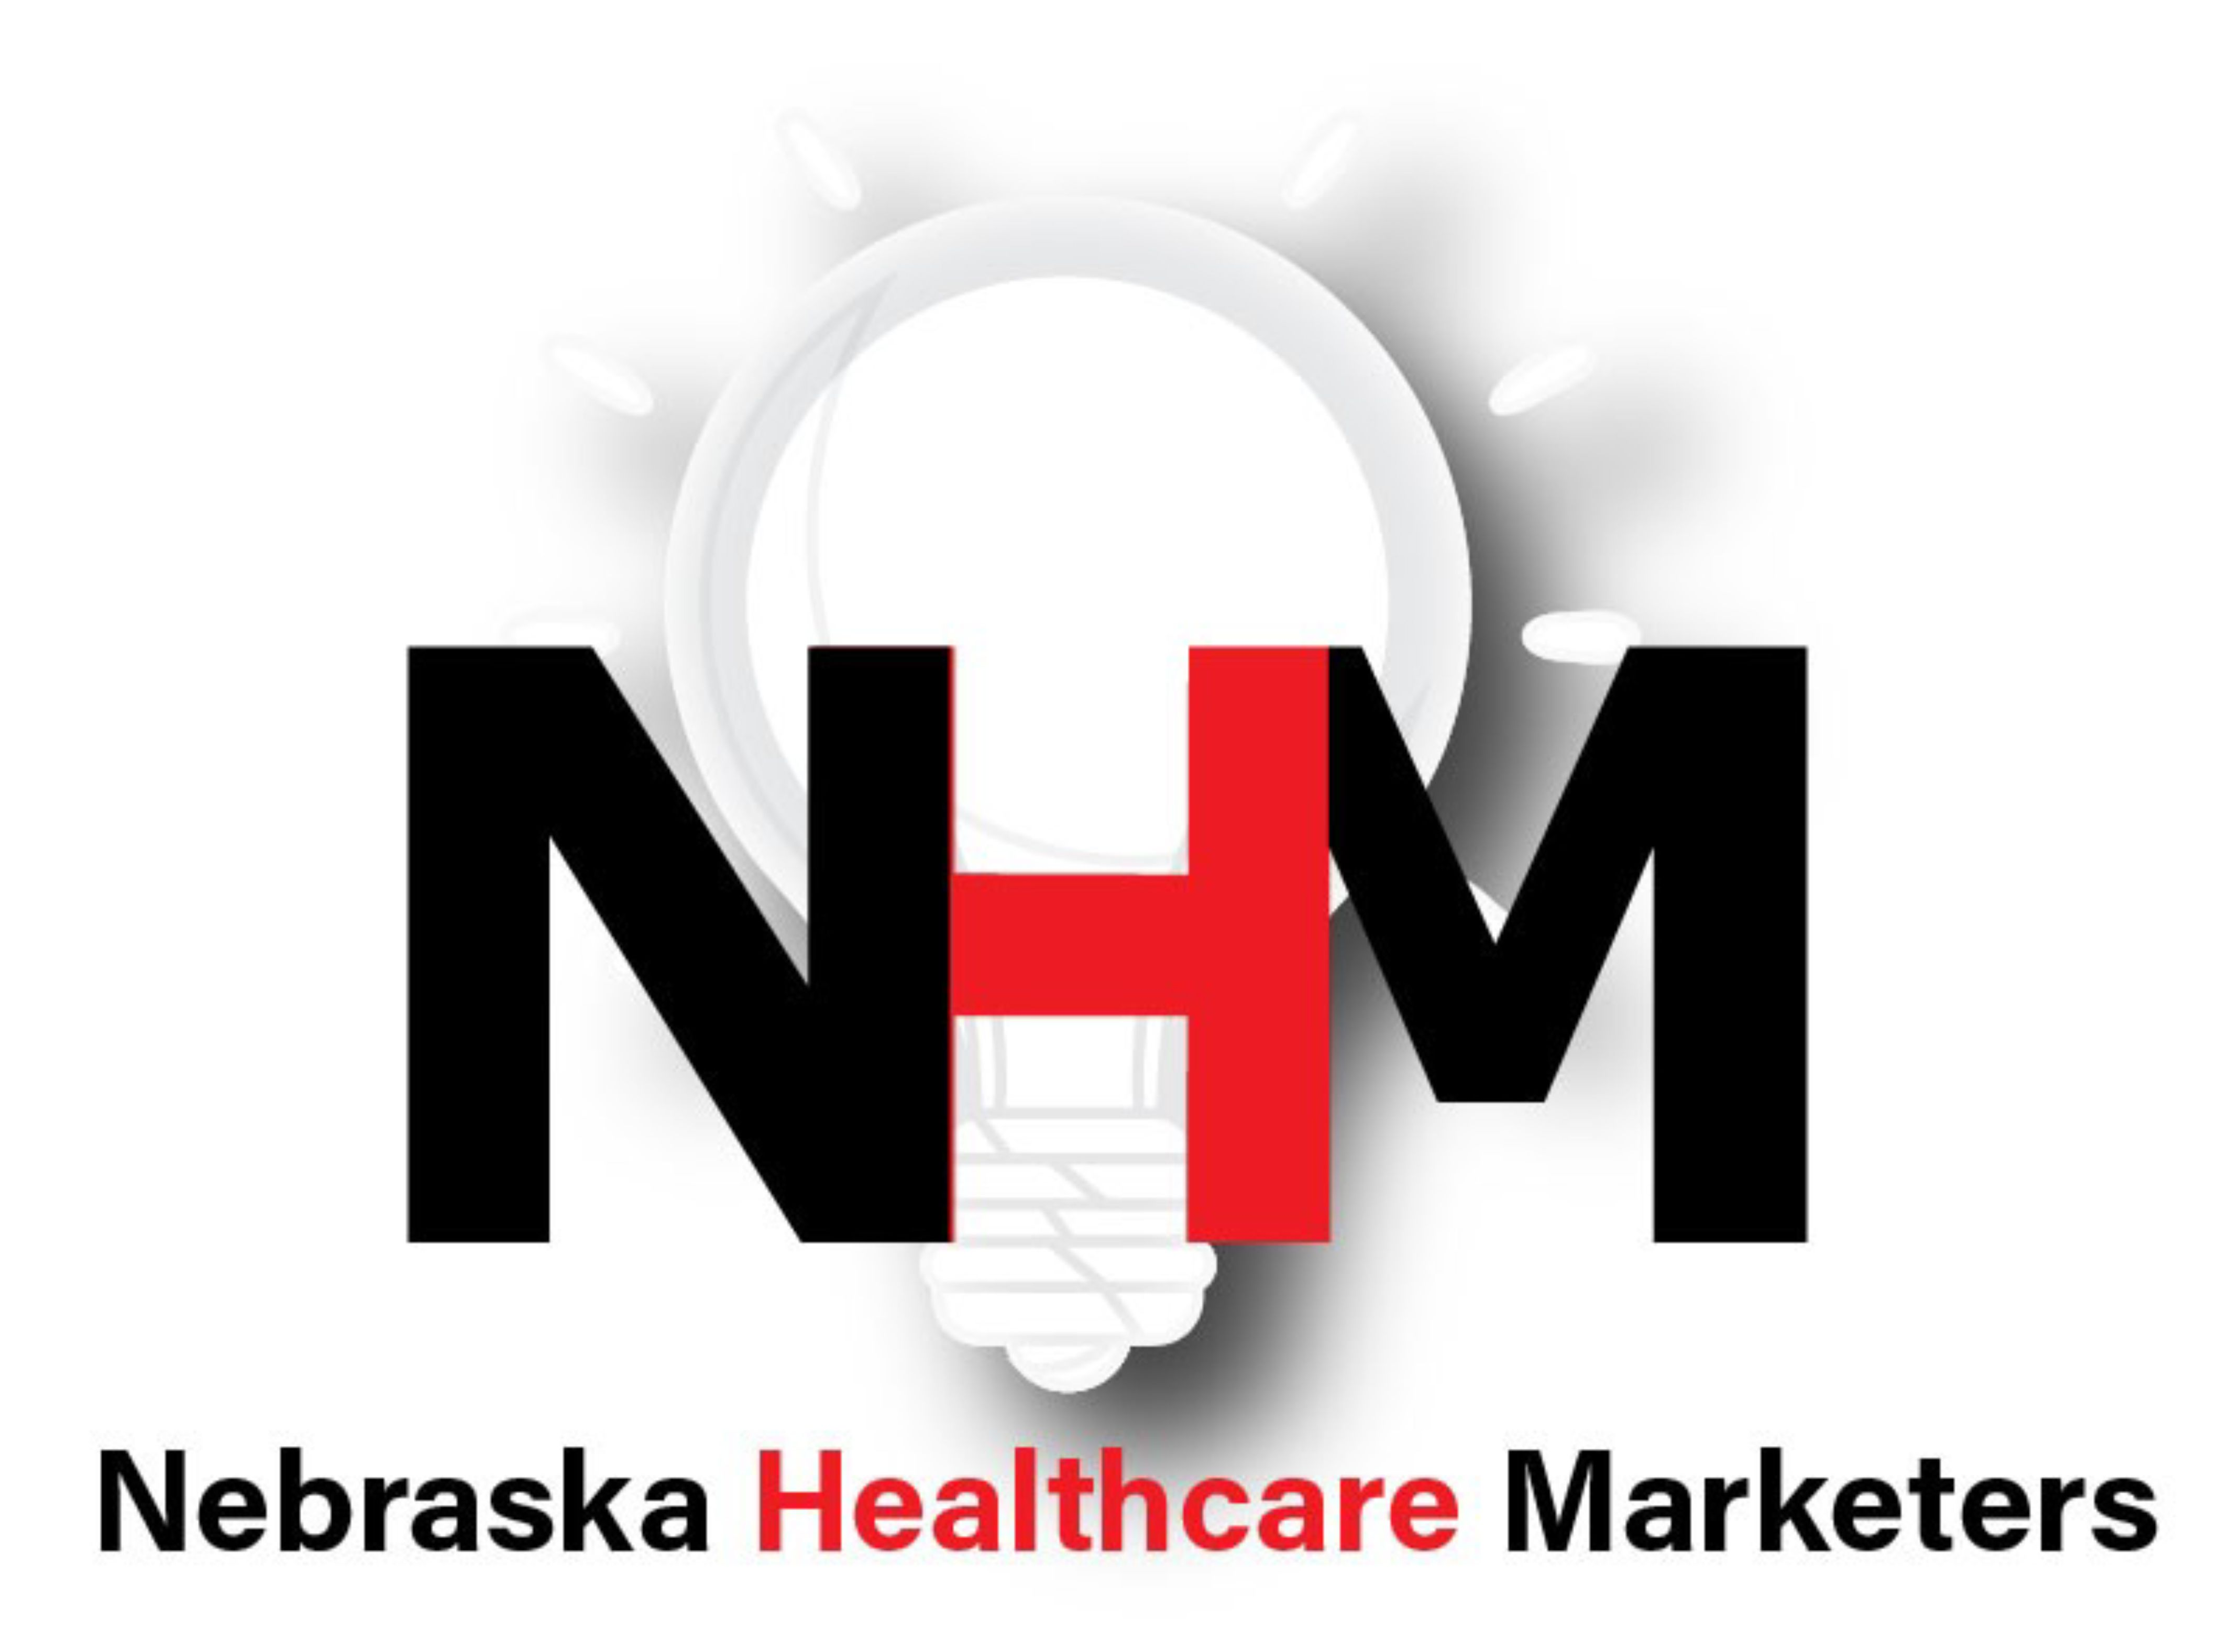 Nebraska Healthcare Marketers